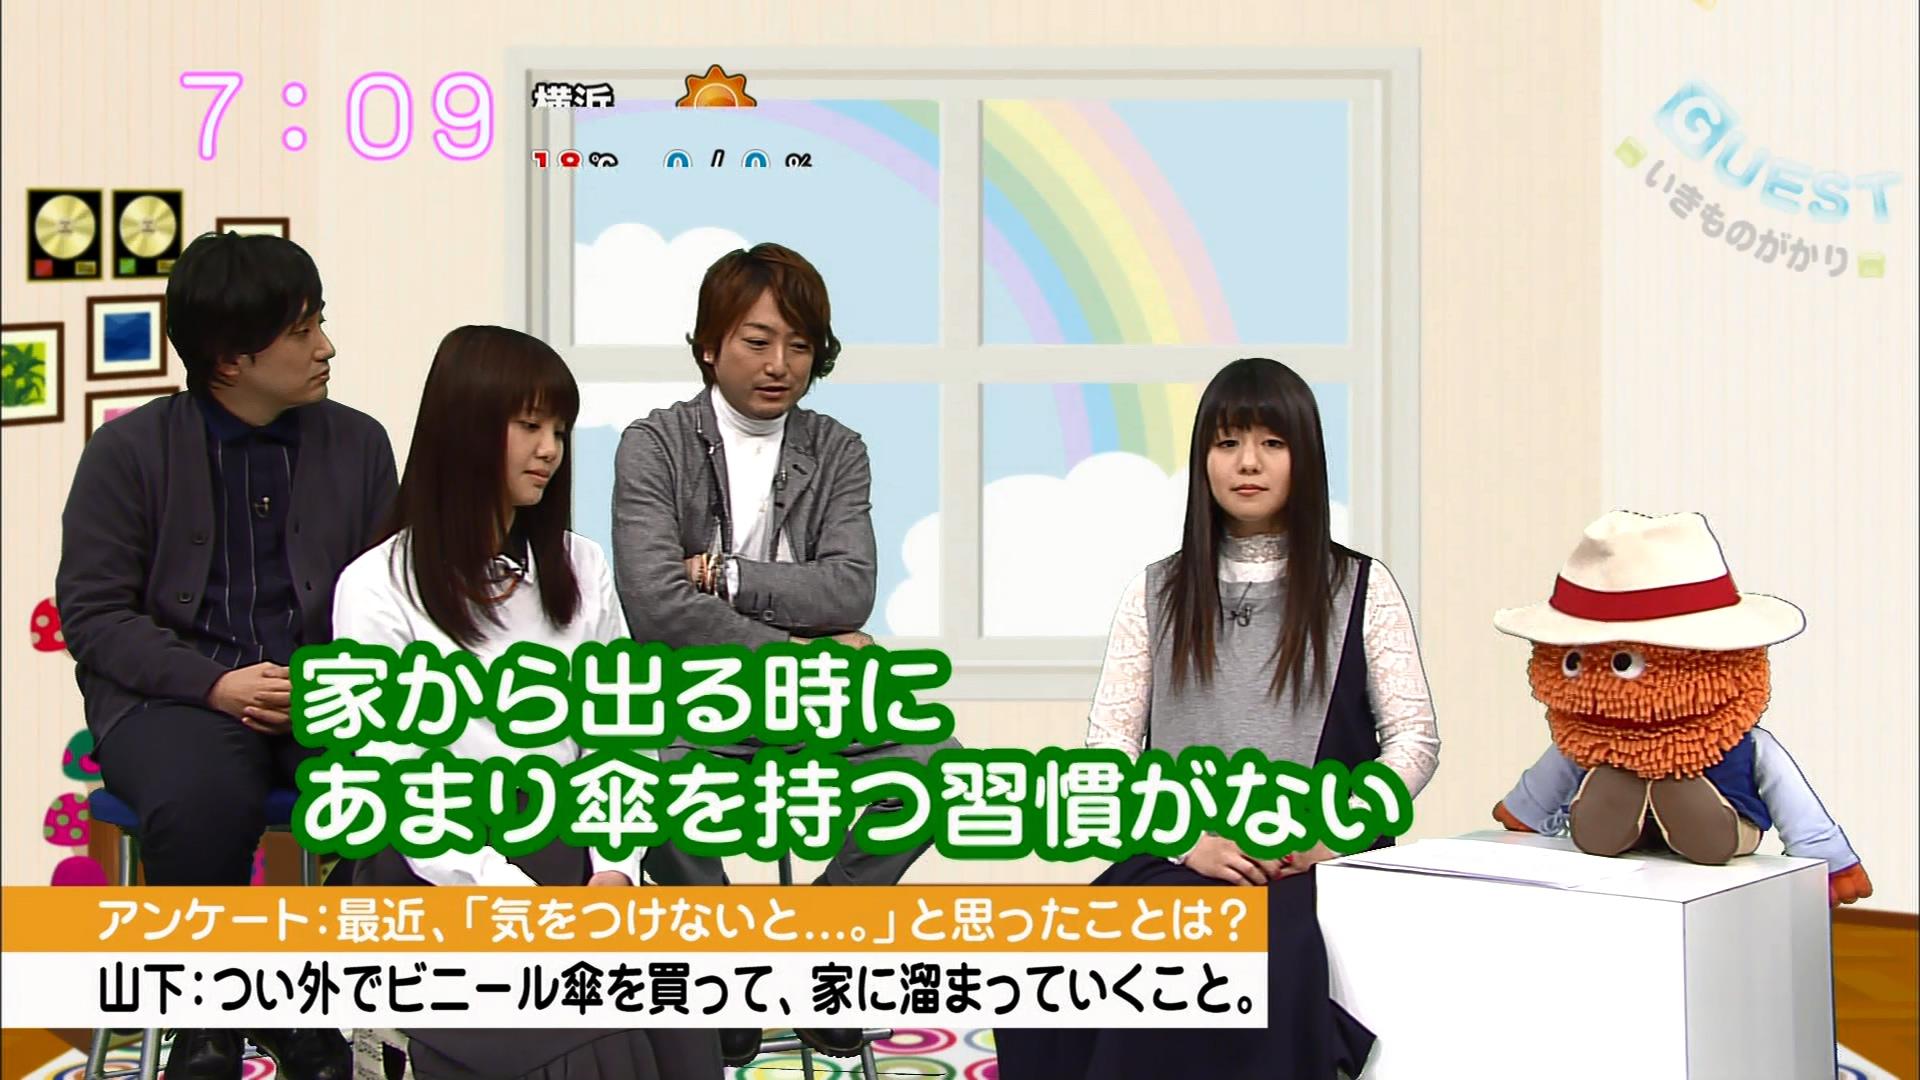 2016.03.17 いきものがかり(saku saku).ts_20160317_080426.208